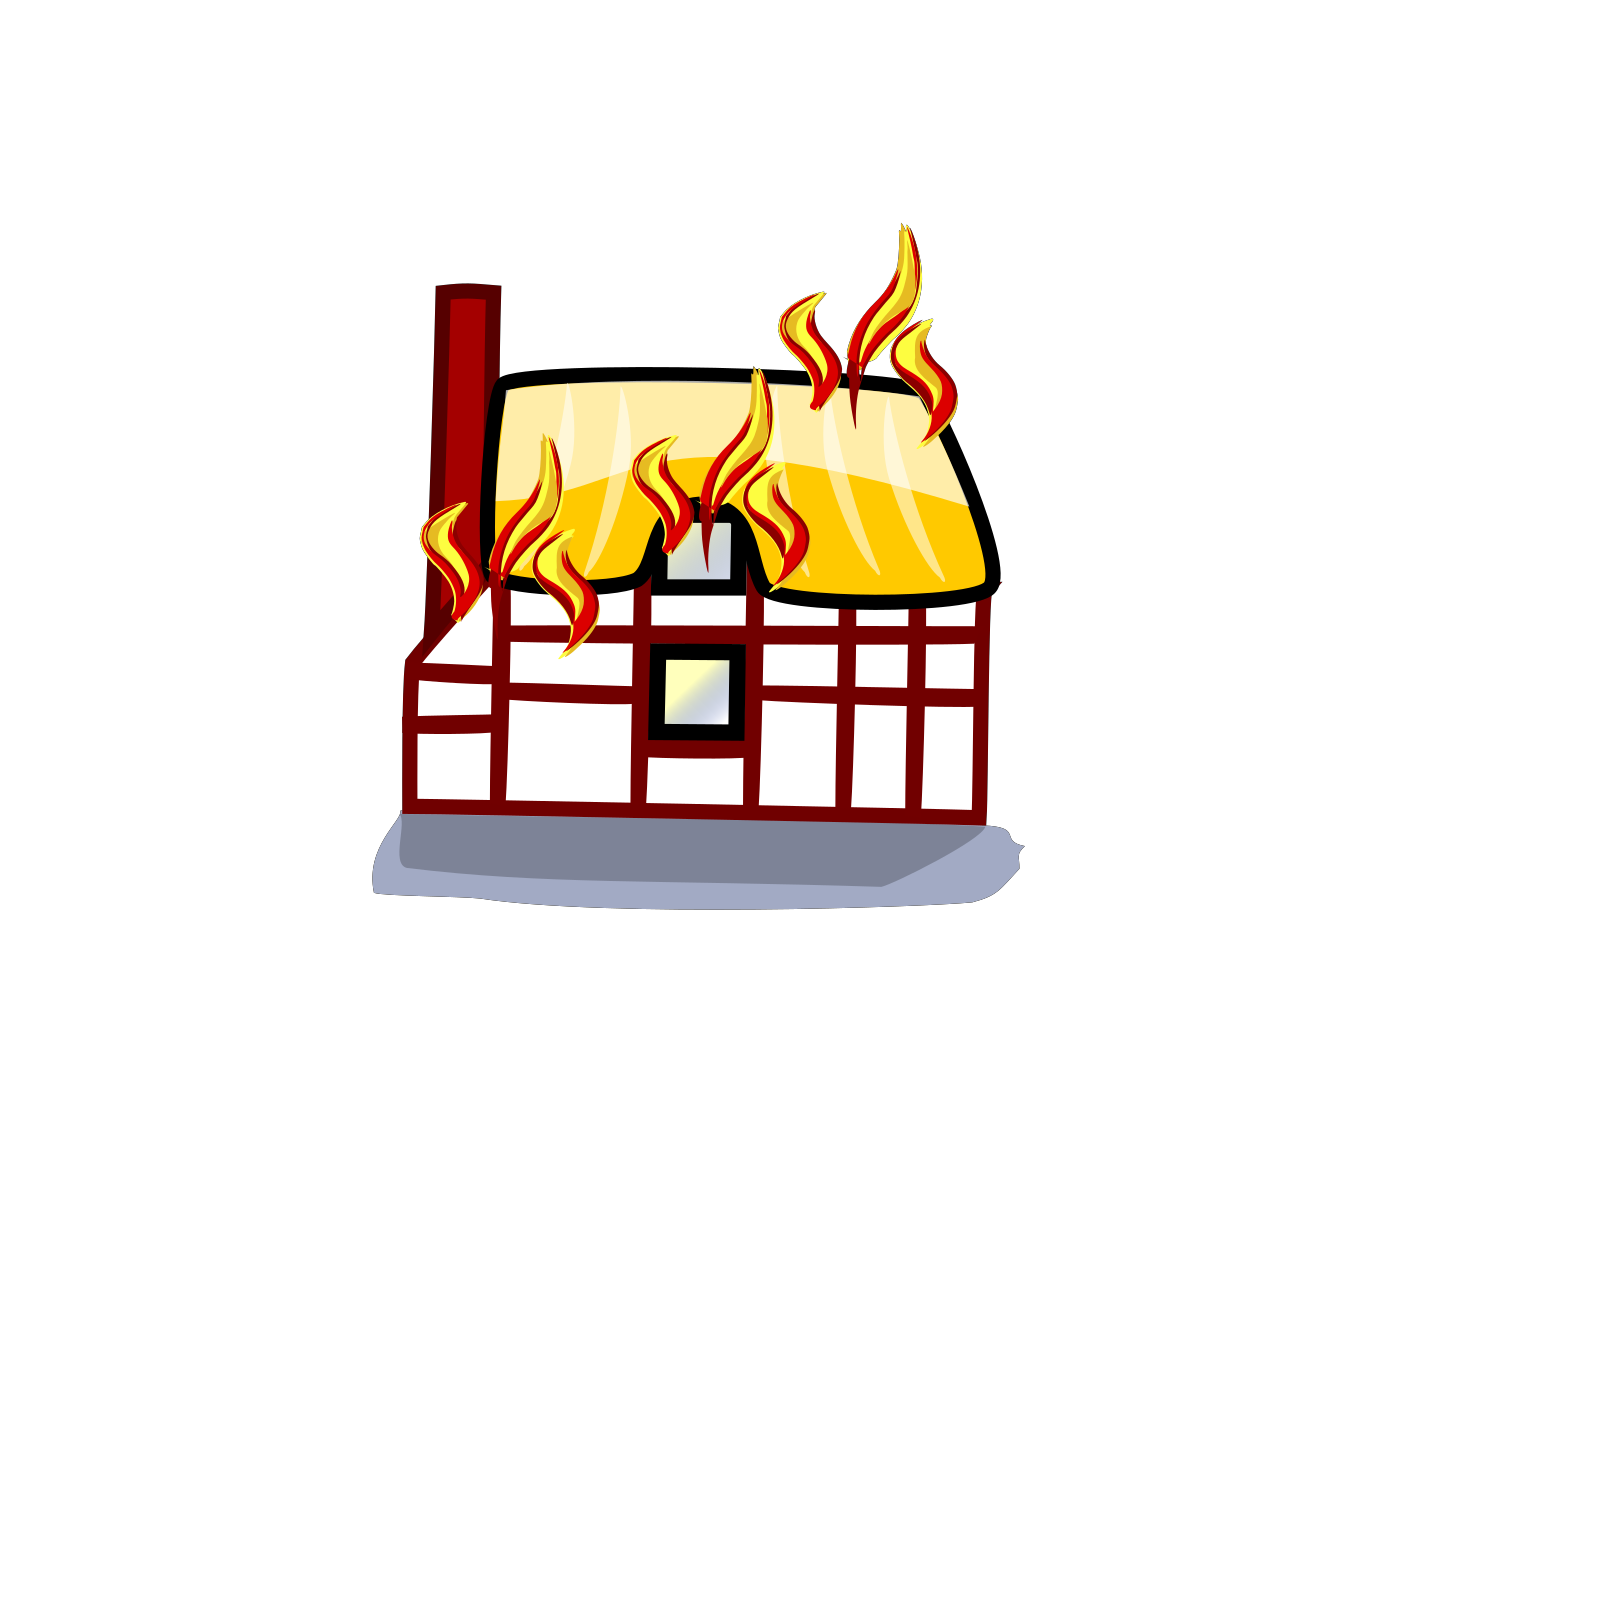 House Fire Insurance Svg Vector House Fire Insurance Clip Art Svg Clipart